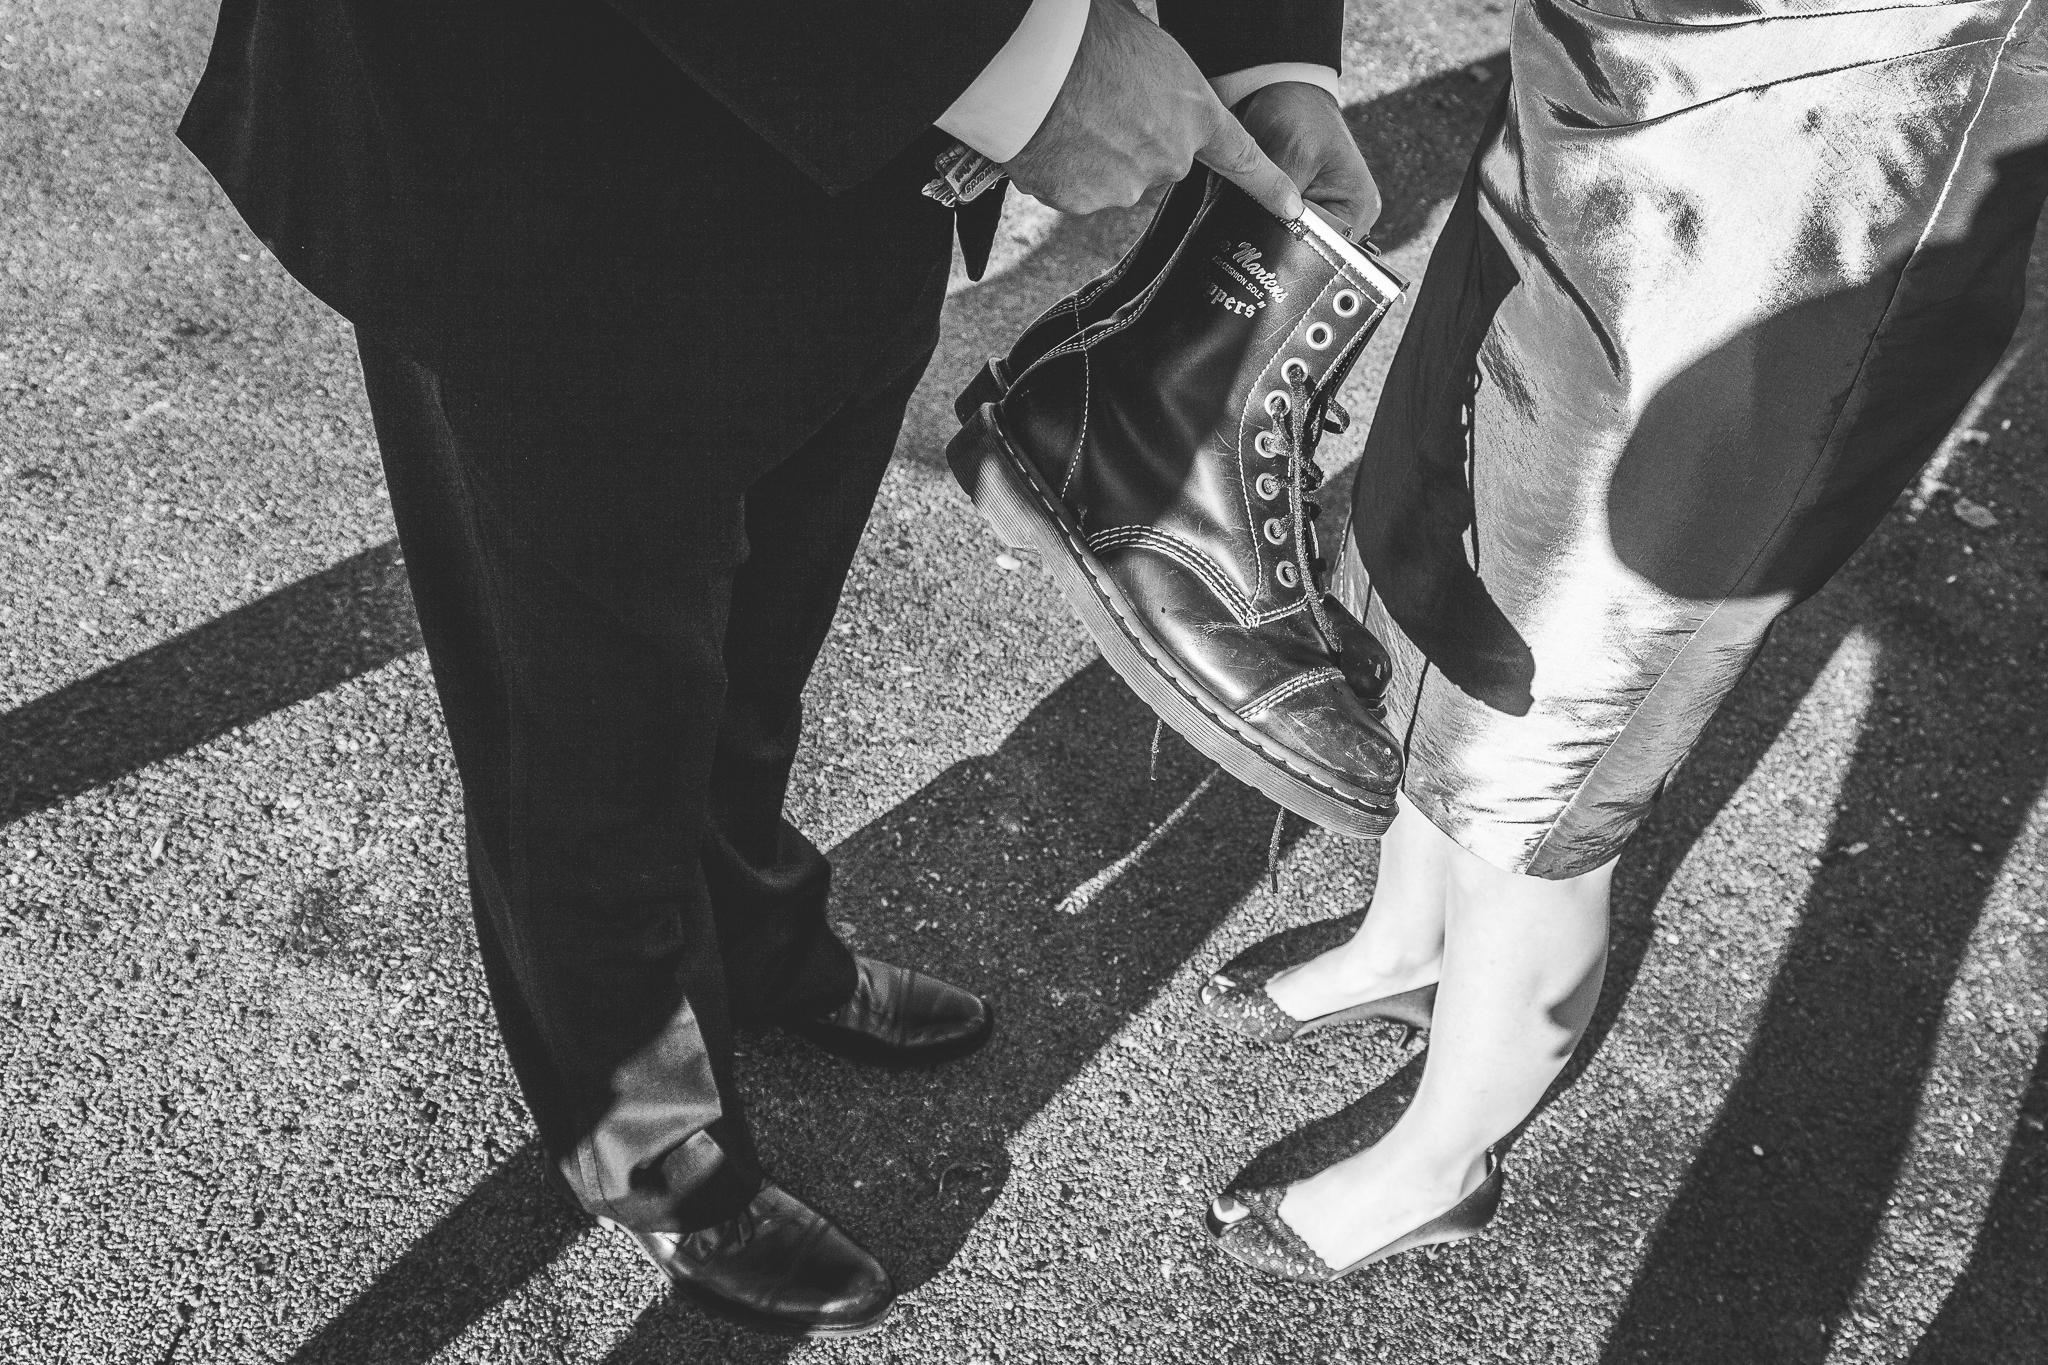 camuglia-whomstudio-chelsea_and_andy-nycphotographer-wedding-brooklyn-buffalo-timberlodge-020-0083.jpg